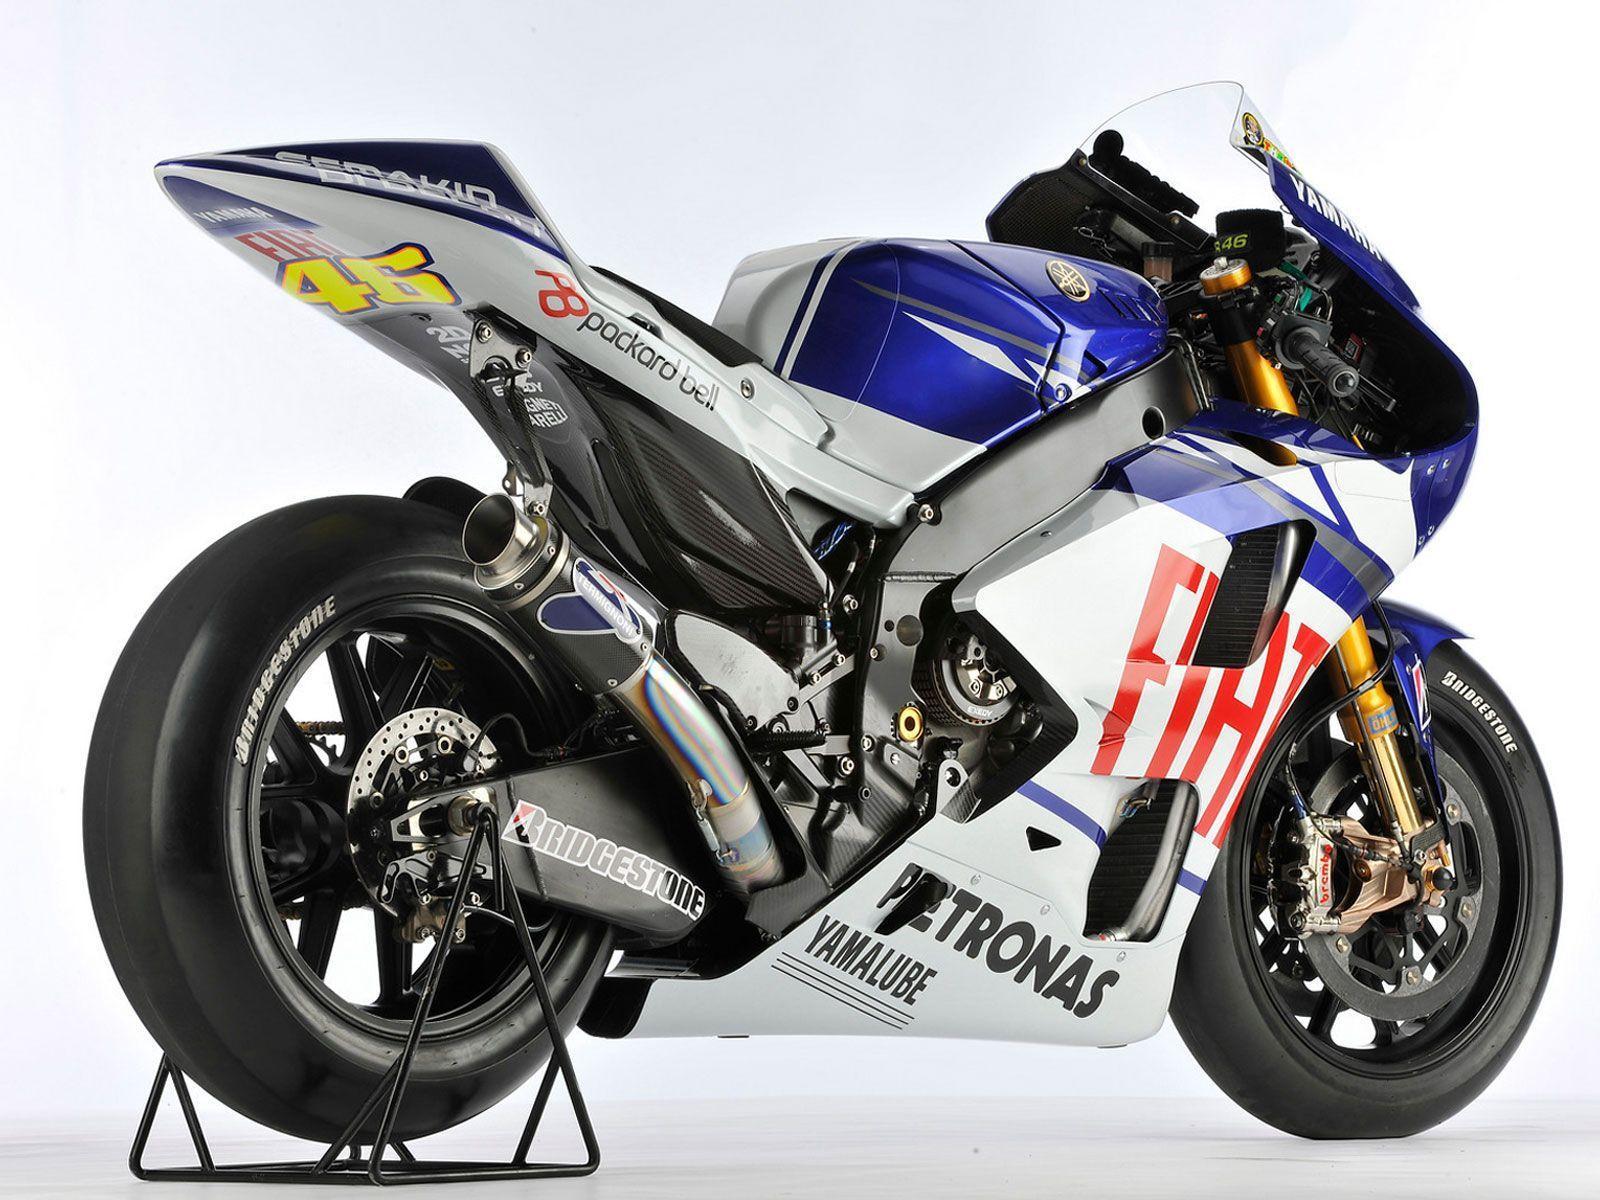 Moto GP Bikes Wallpapers 1600x1200